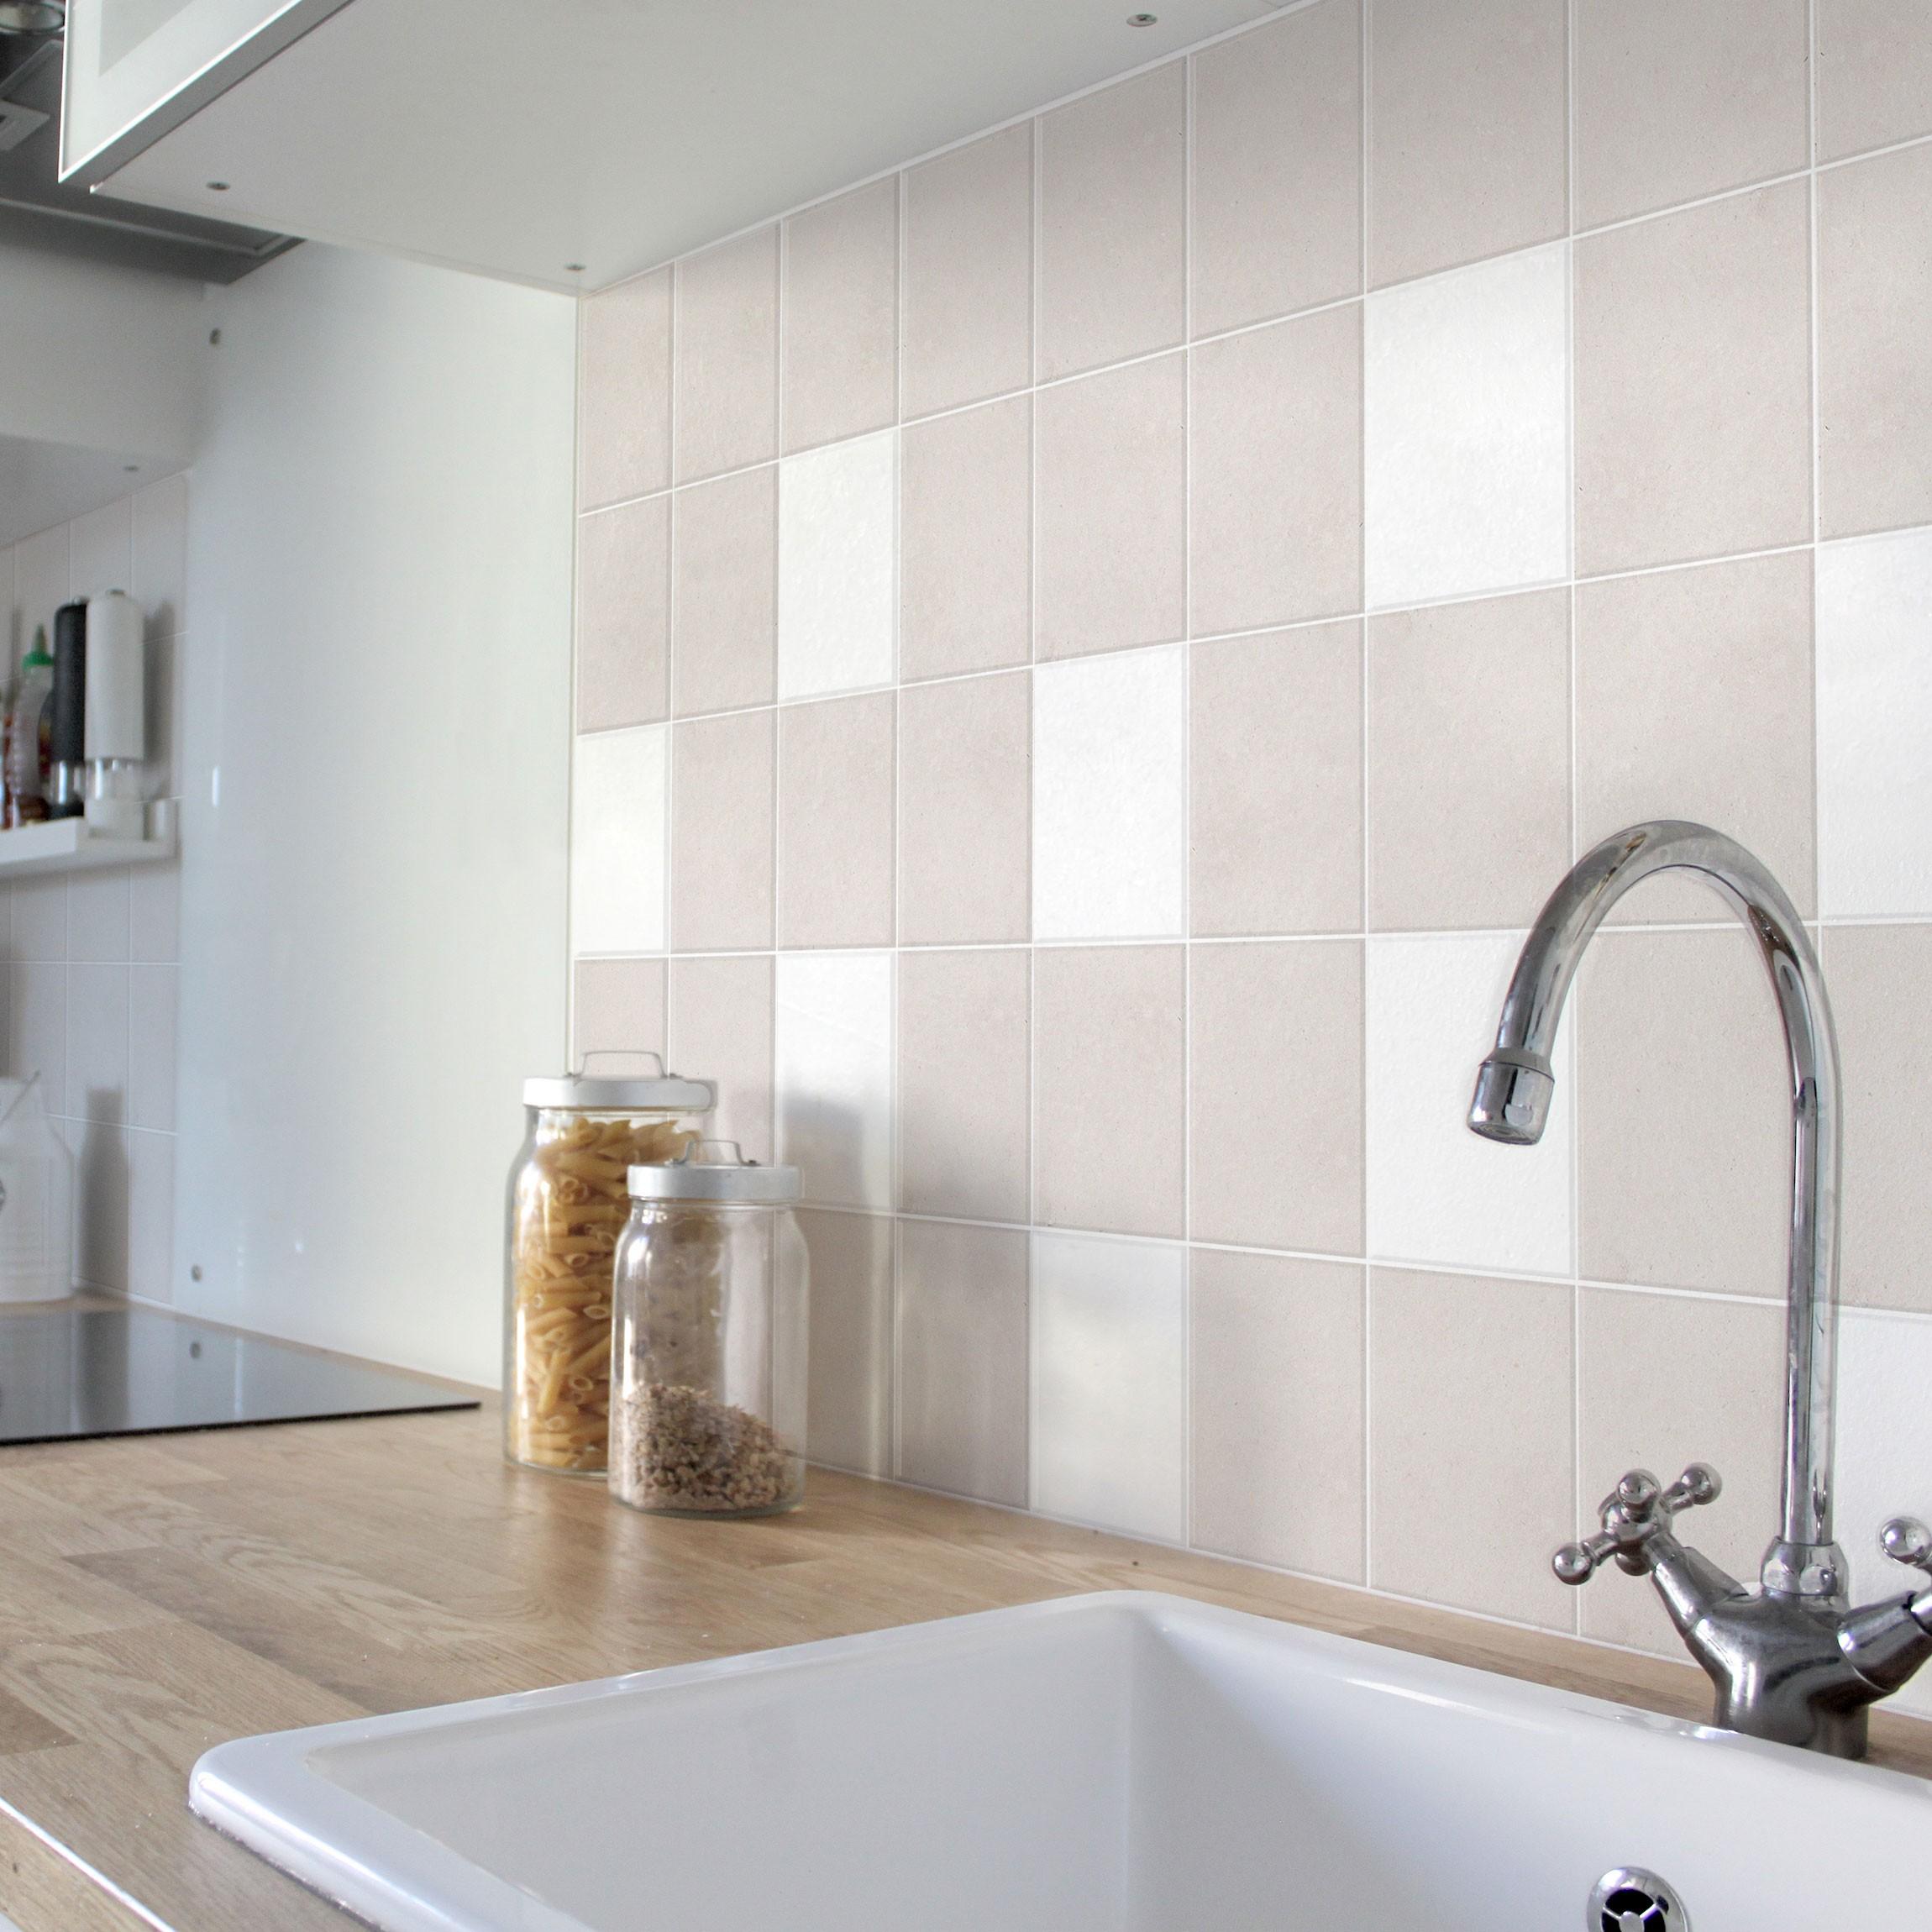 fliesenaufkleber bad k che wei 15x15 cm set. Black Bedroom Furniture Sets. Home Design Ideas